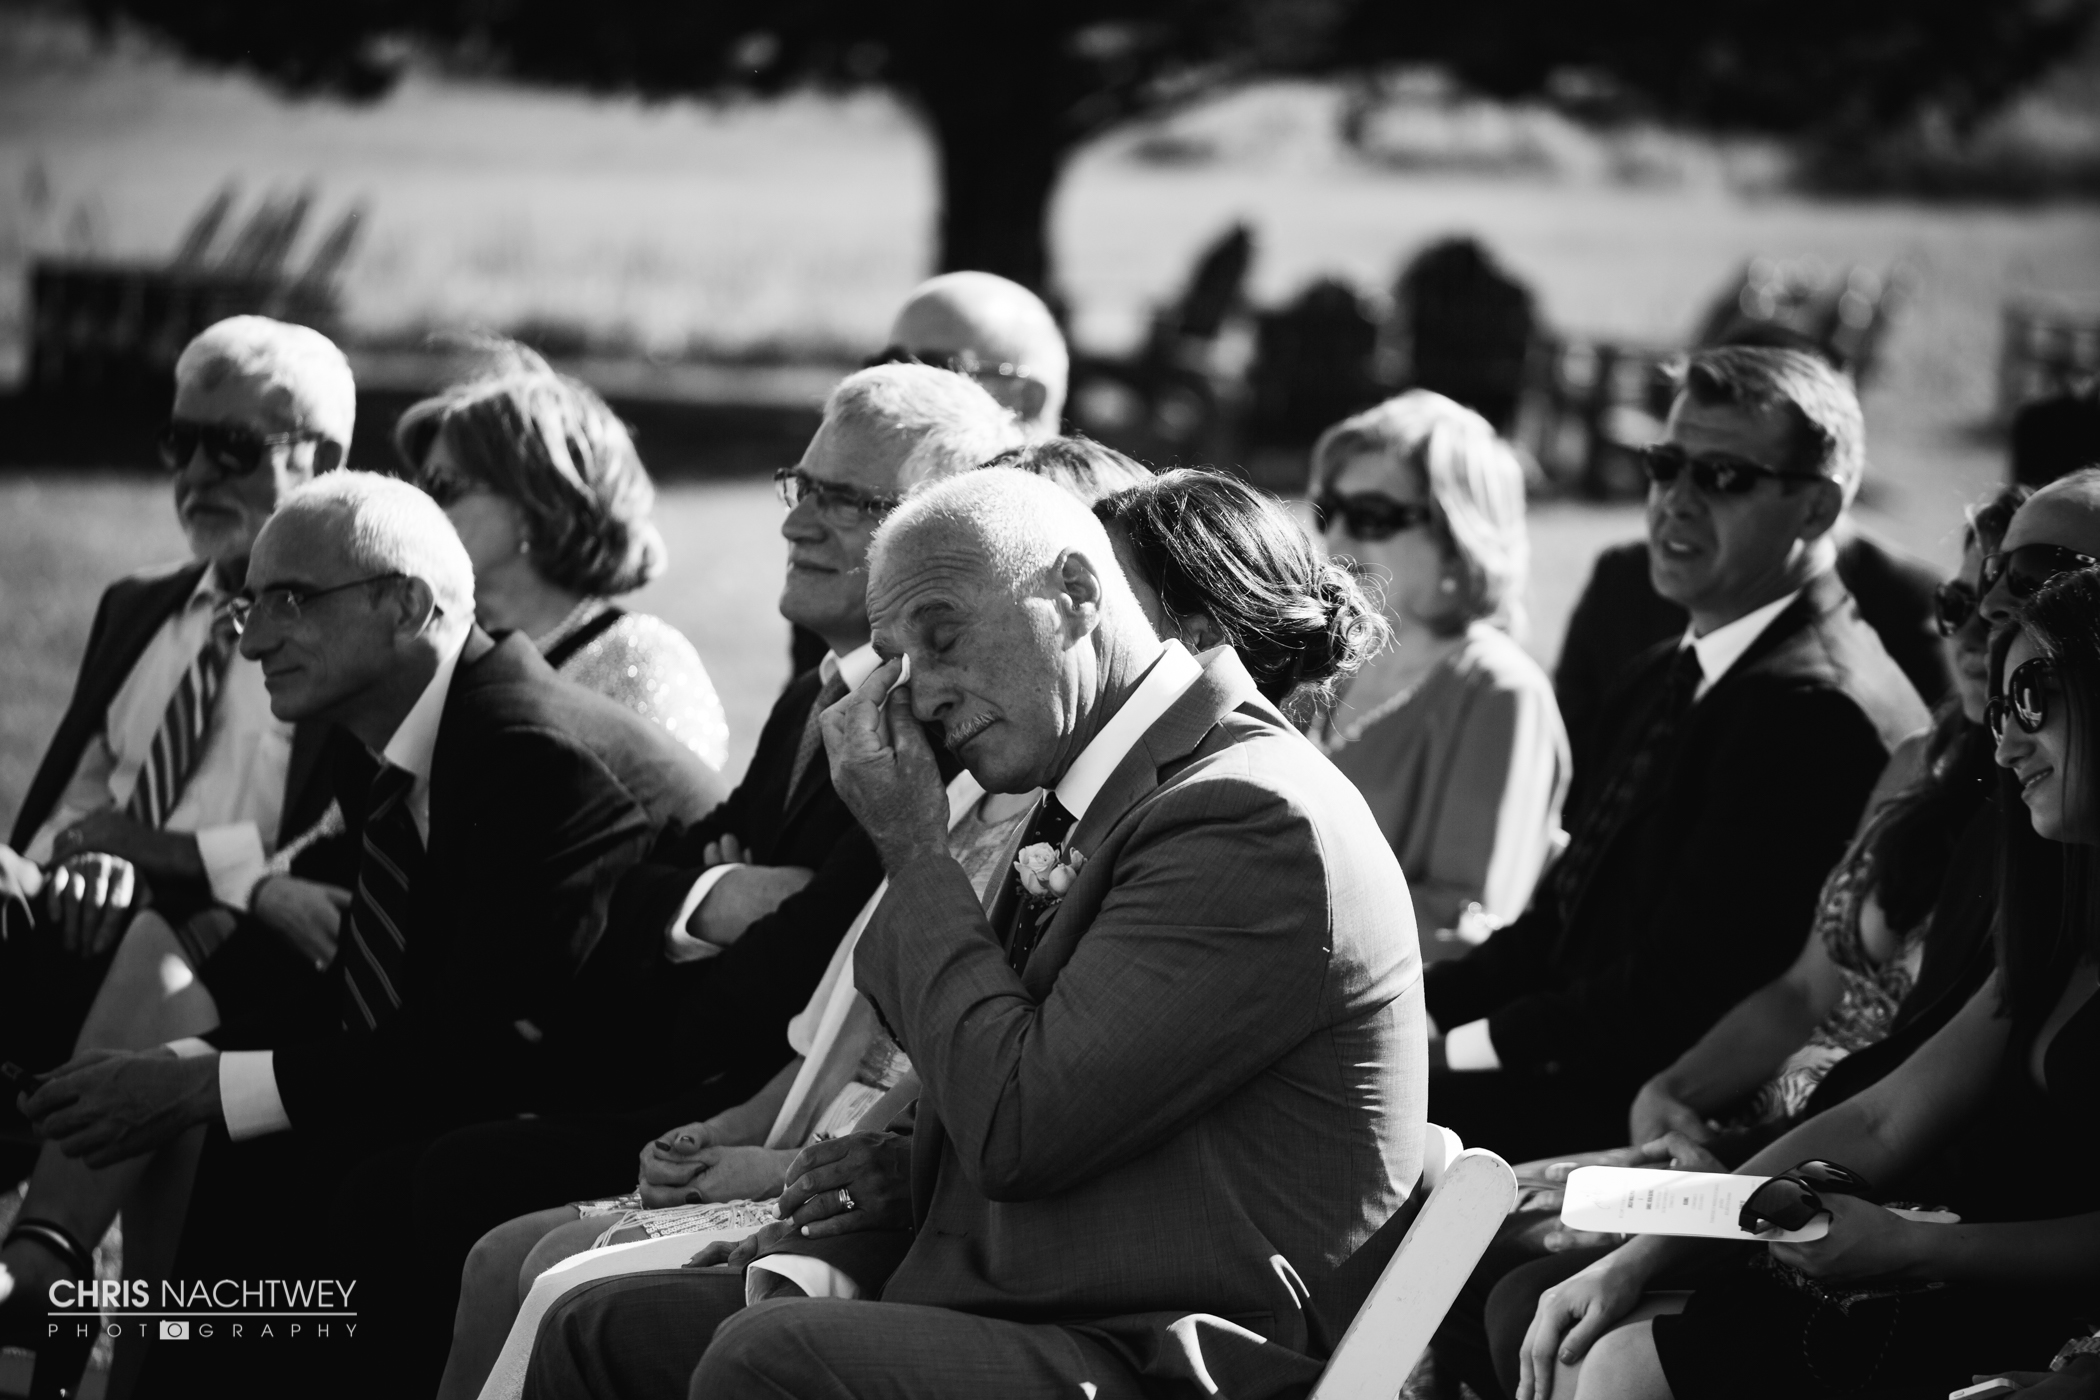 saltwater-farm-vineyard-wedding-photos-lindsay-gabe-chris-nachtwey-photography-2017-37.jpg